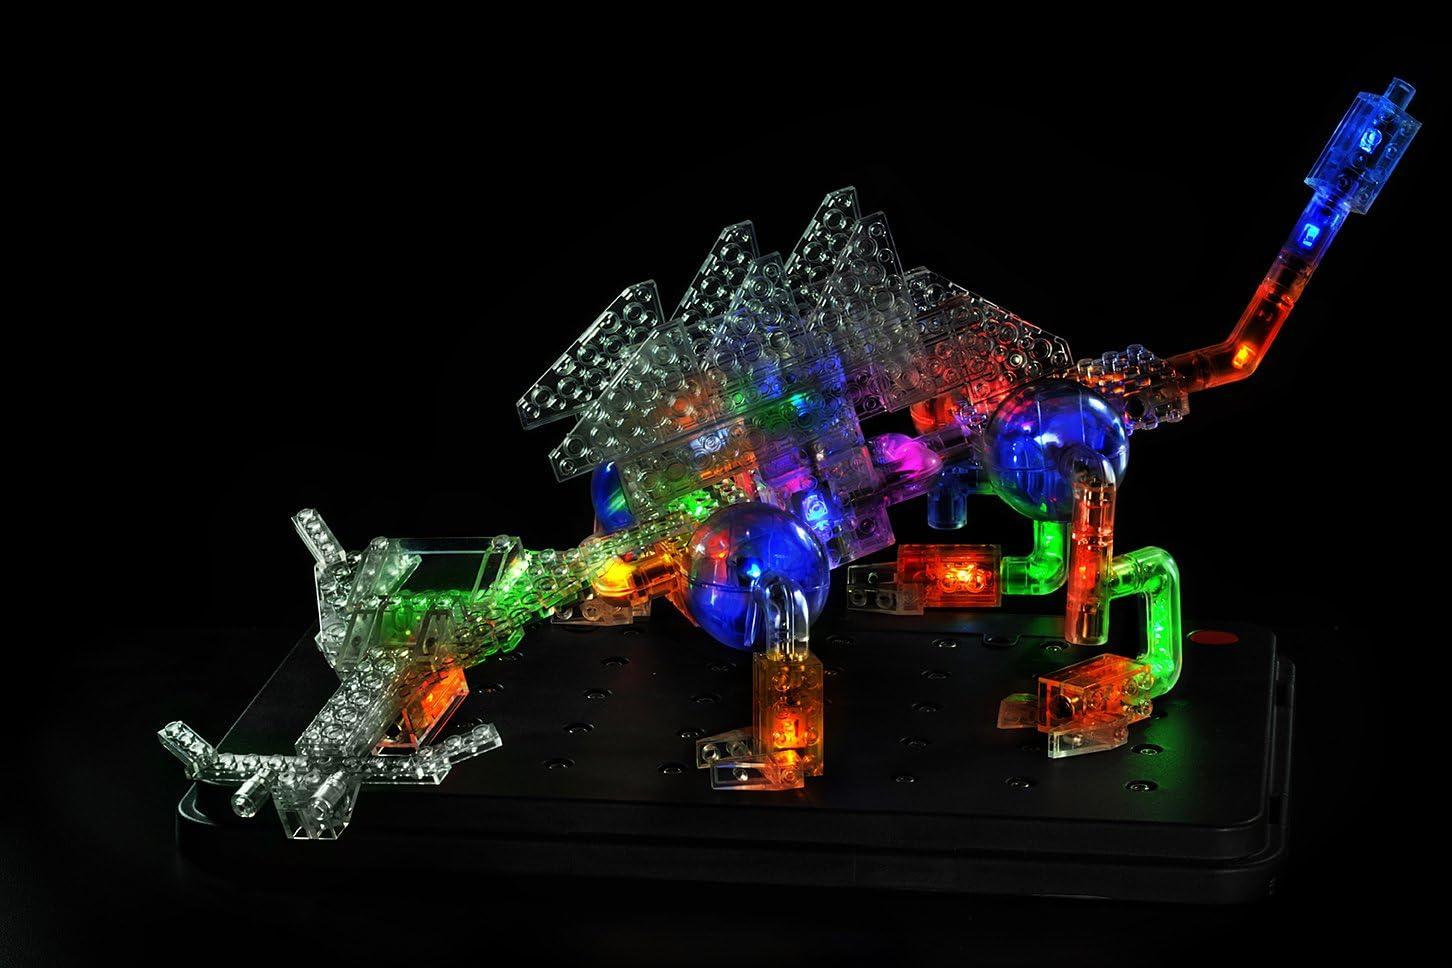 Laser Pegs 57-in-1 Dragon Building Set